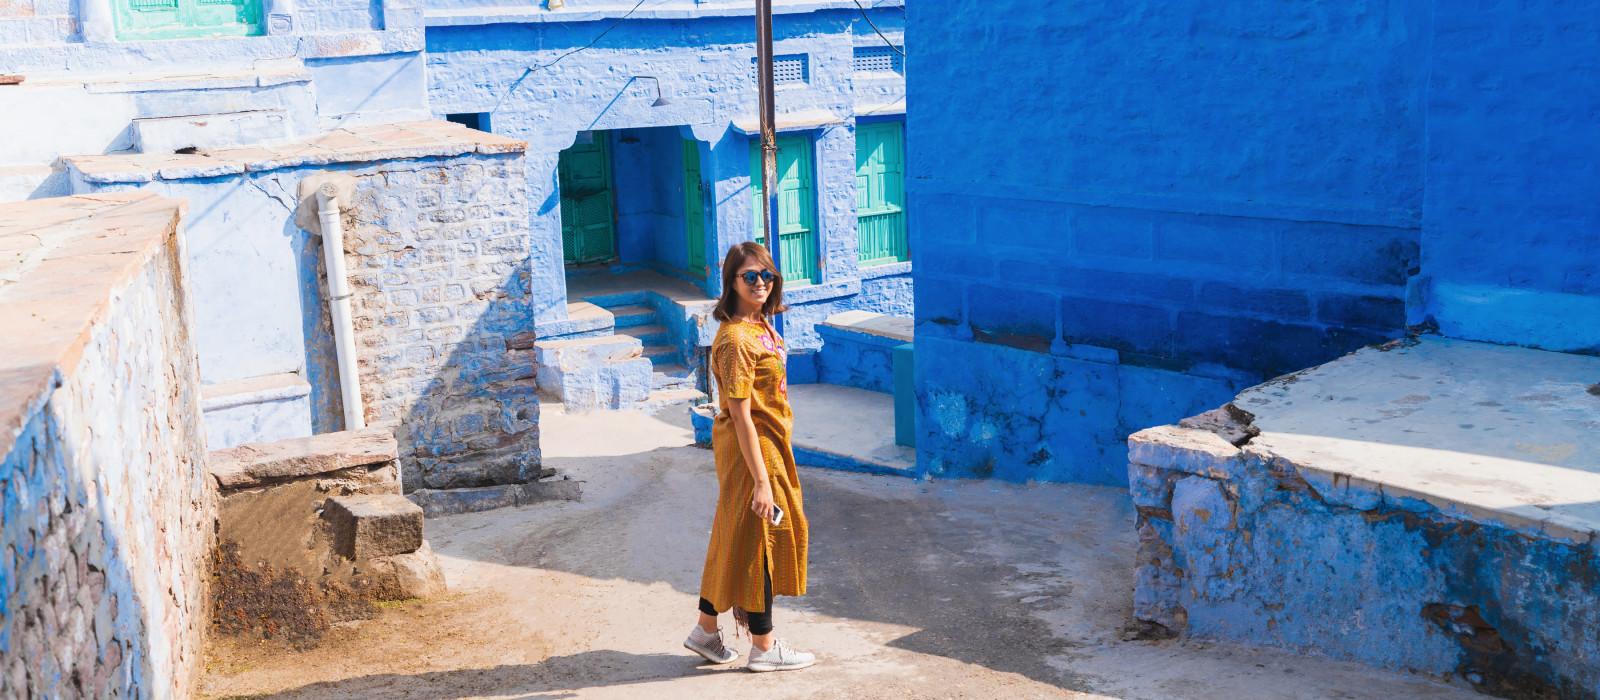 Beautiful Traveler explore in Heart of Blue City, Jodhpur, Rajasthan - India